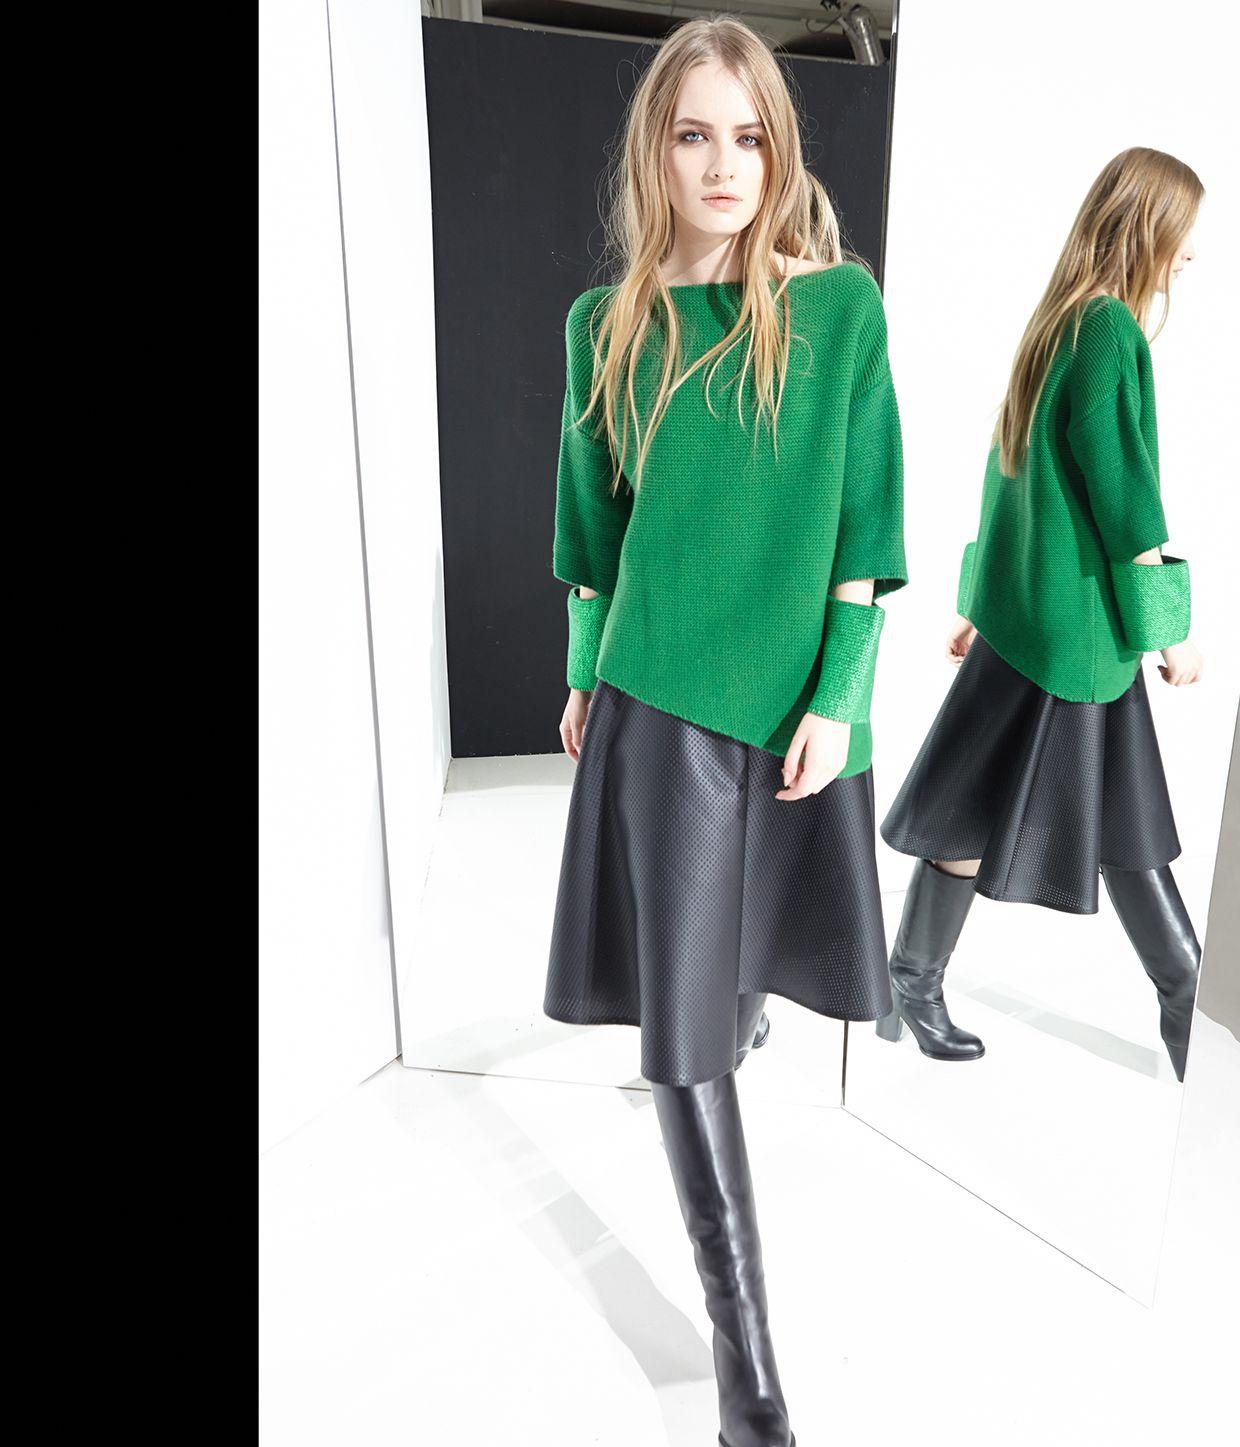 nude fashion abbigliamento knitwear maglieria knit-sweater lamina skirt eco-leather moda style